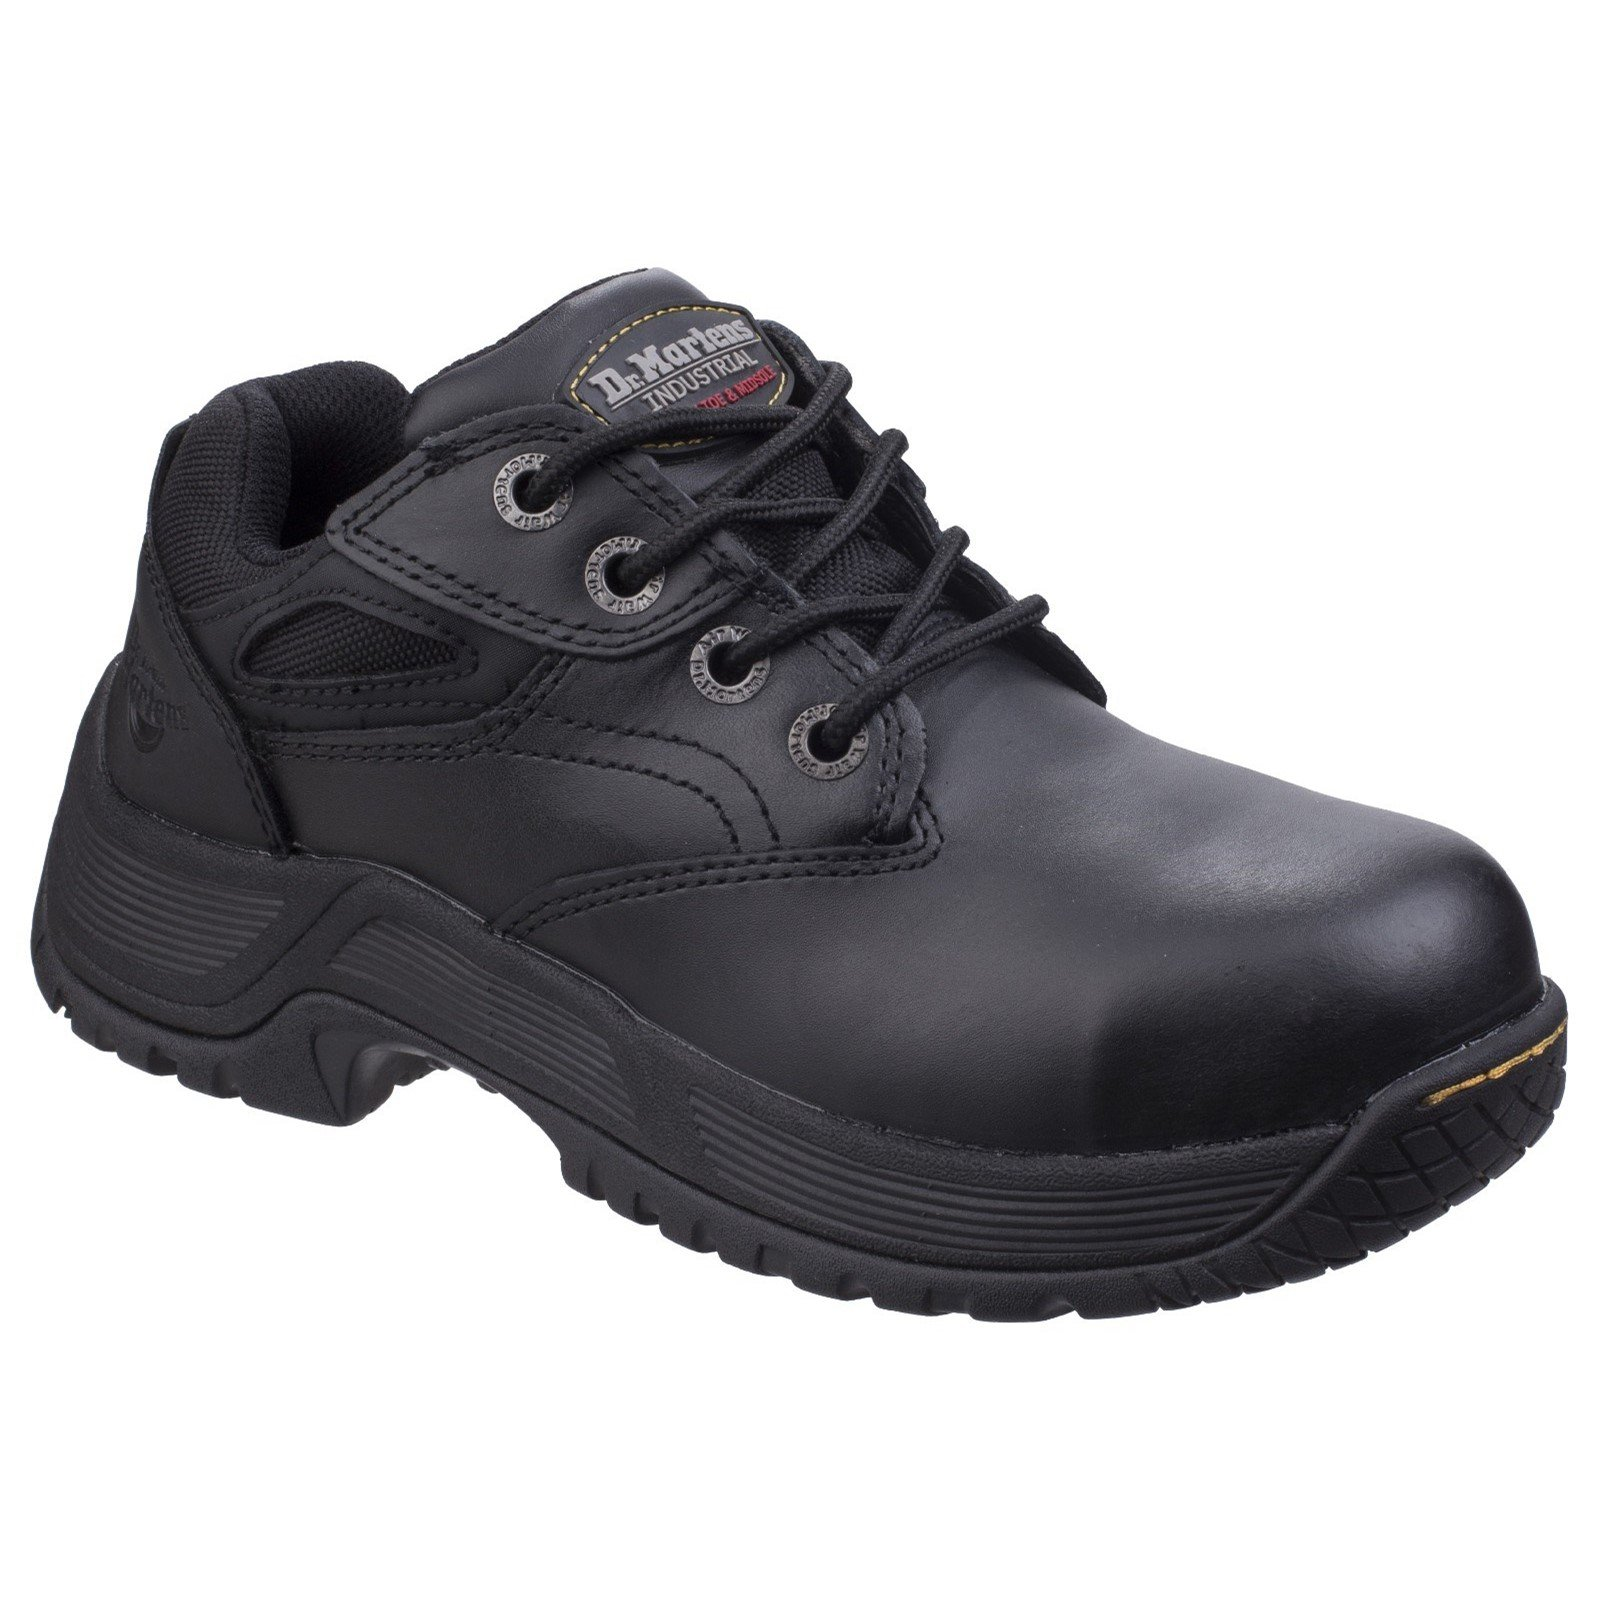 Dr Martens Unisex Calvert Steel Toe Safety Trainer Black 26022 - Black 5